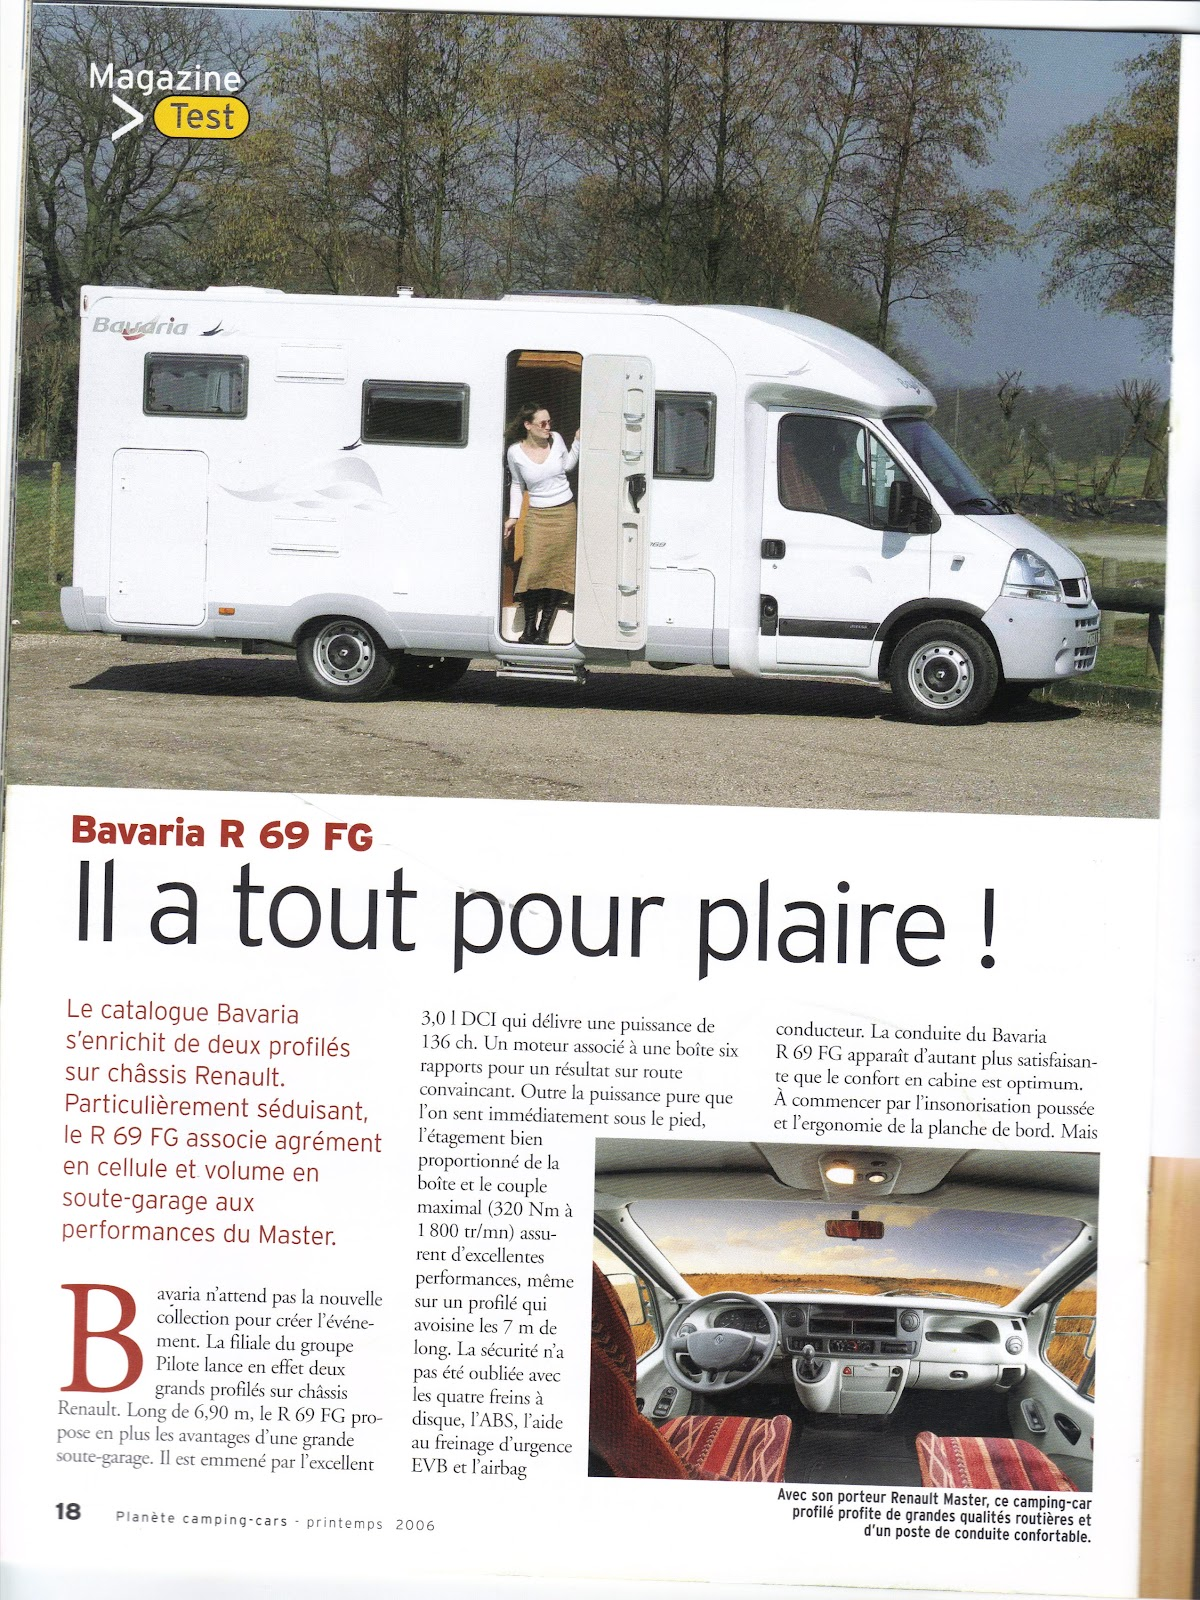 camping car bavaria r69 bavaria article magazine. Black Bedroom Furniture Sets. Home Design Ideas